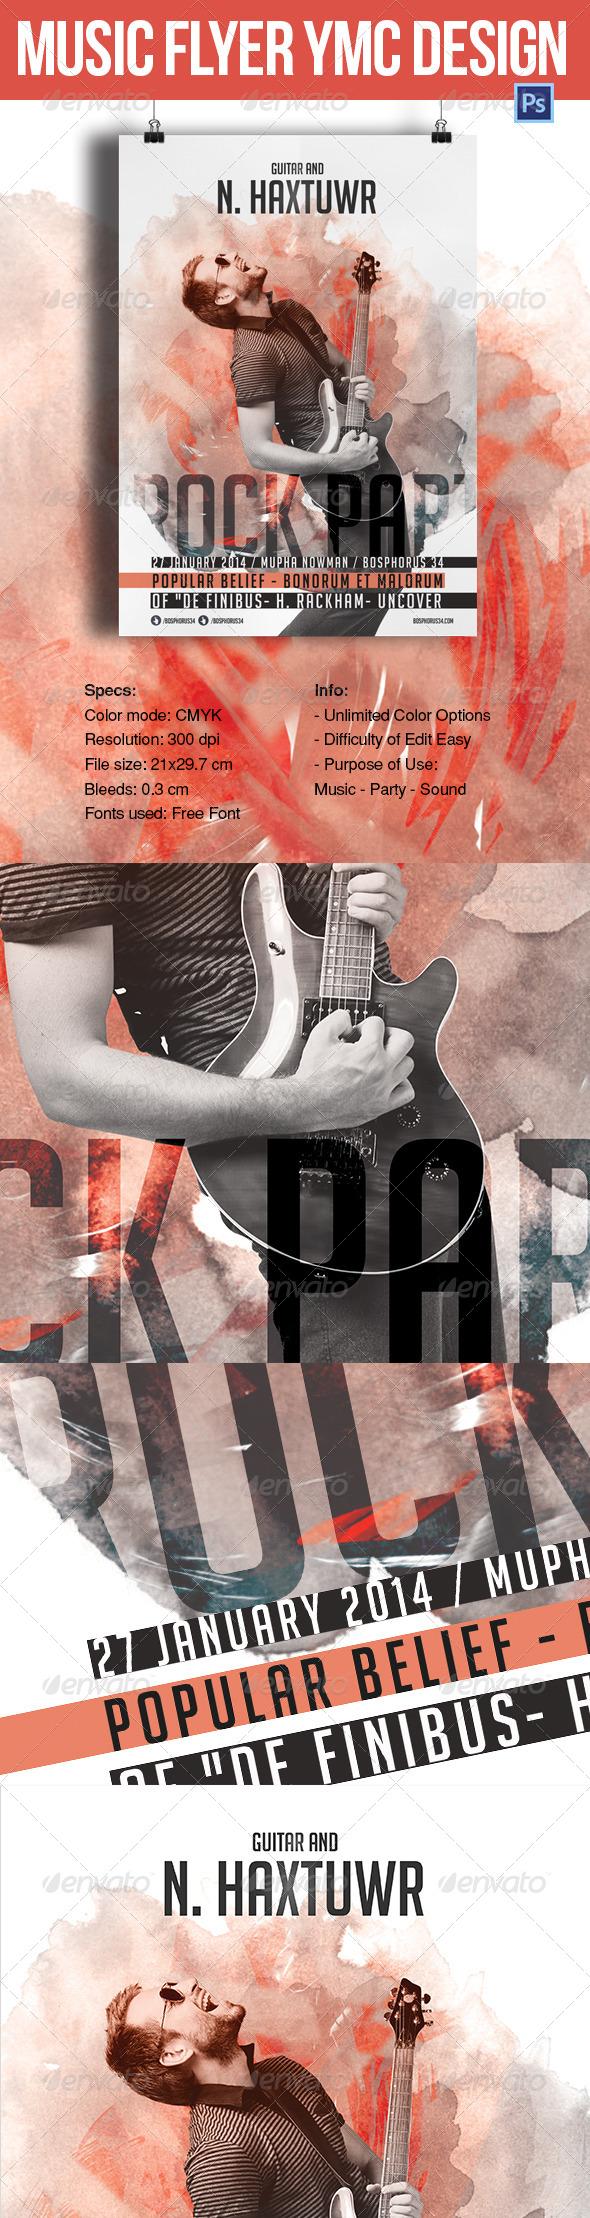 GraphicRiver Music Flyer YMC Design 7070481